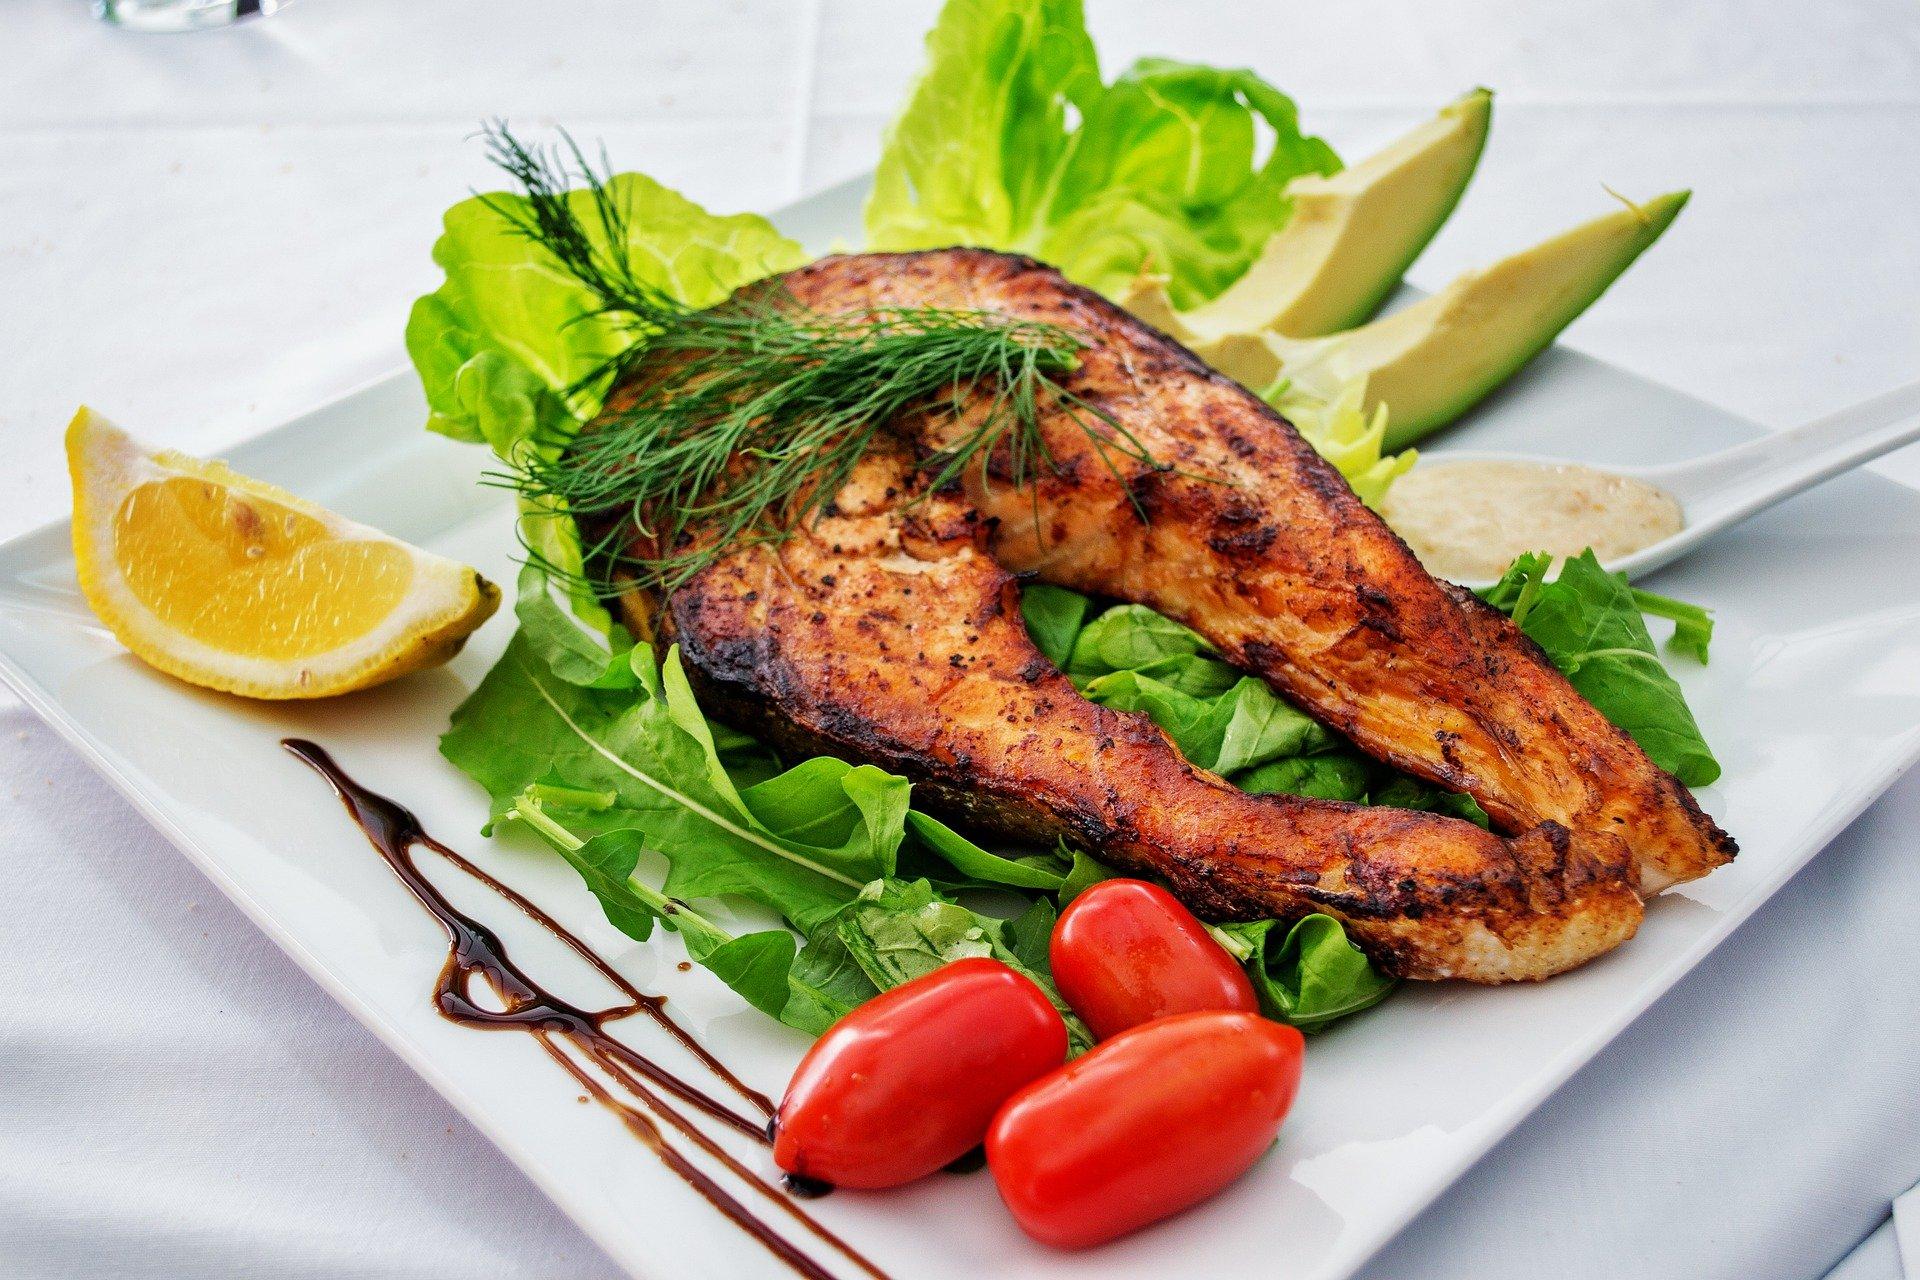 Salmon on lettuce.